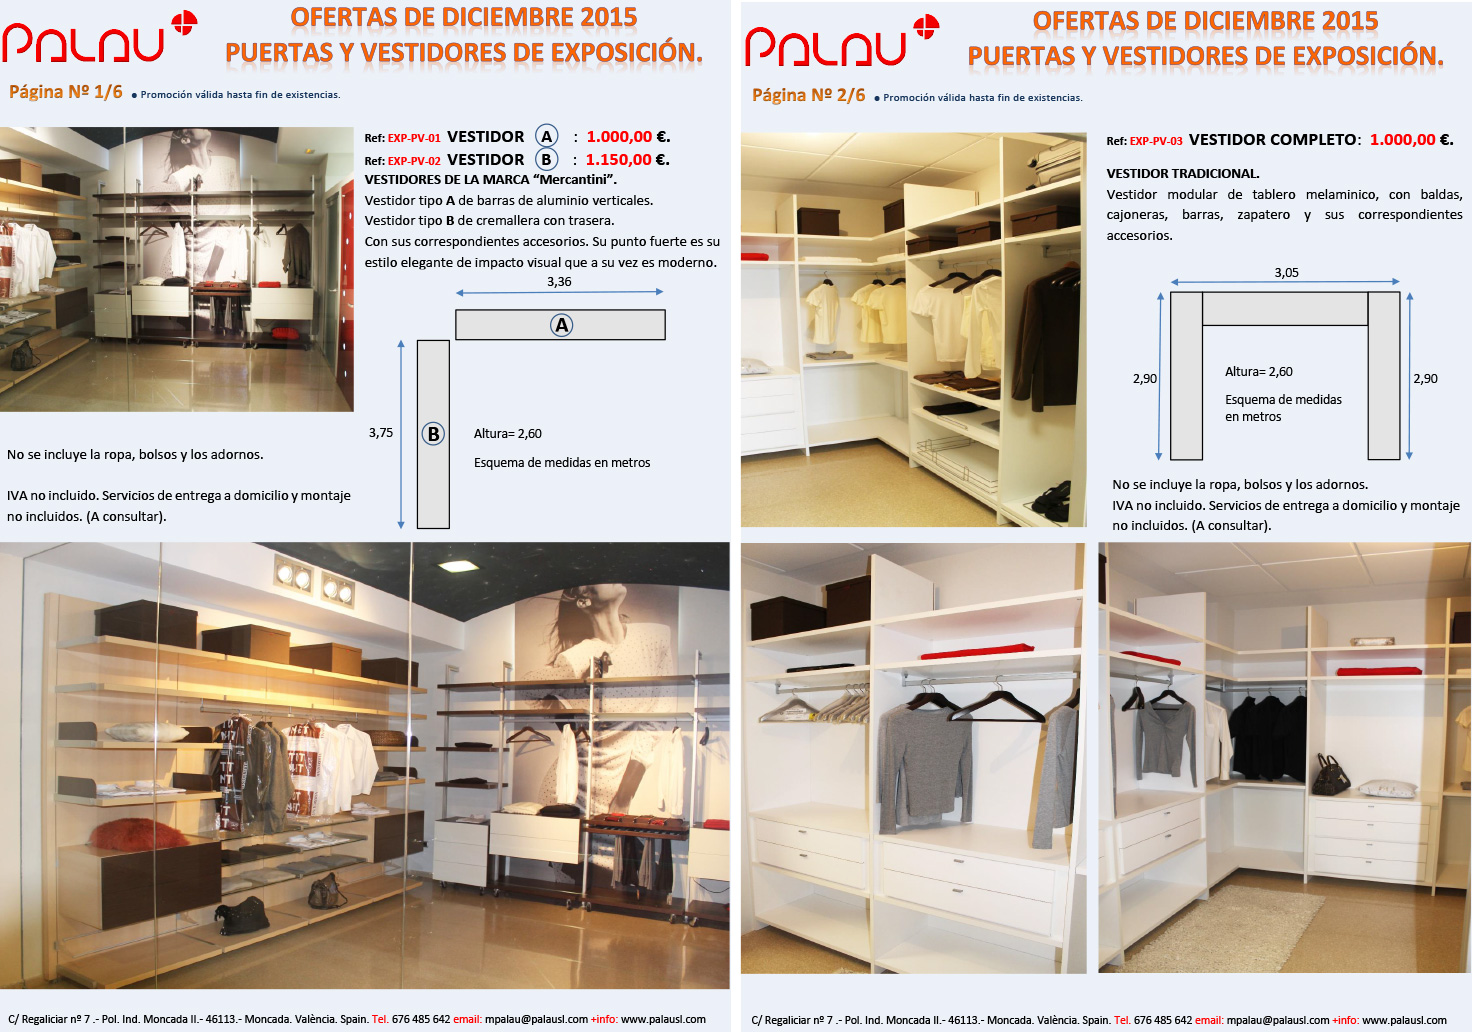 www.palausl.com